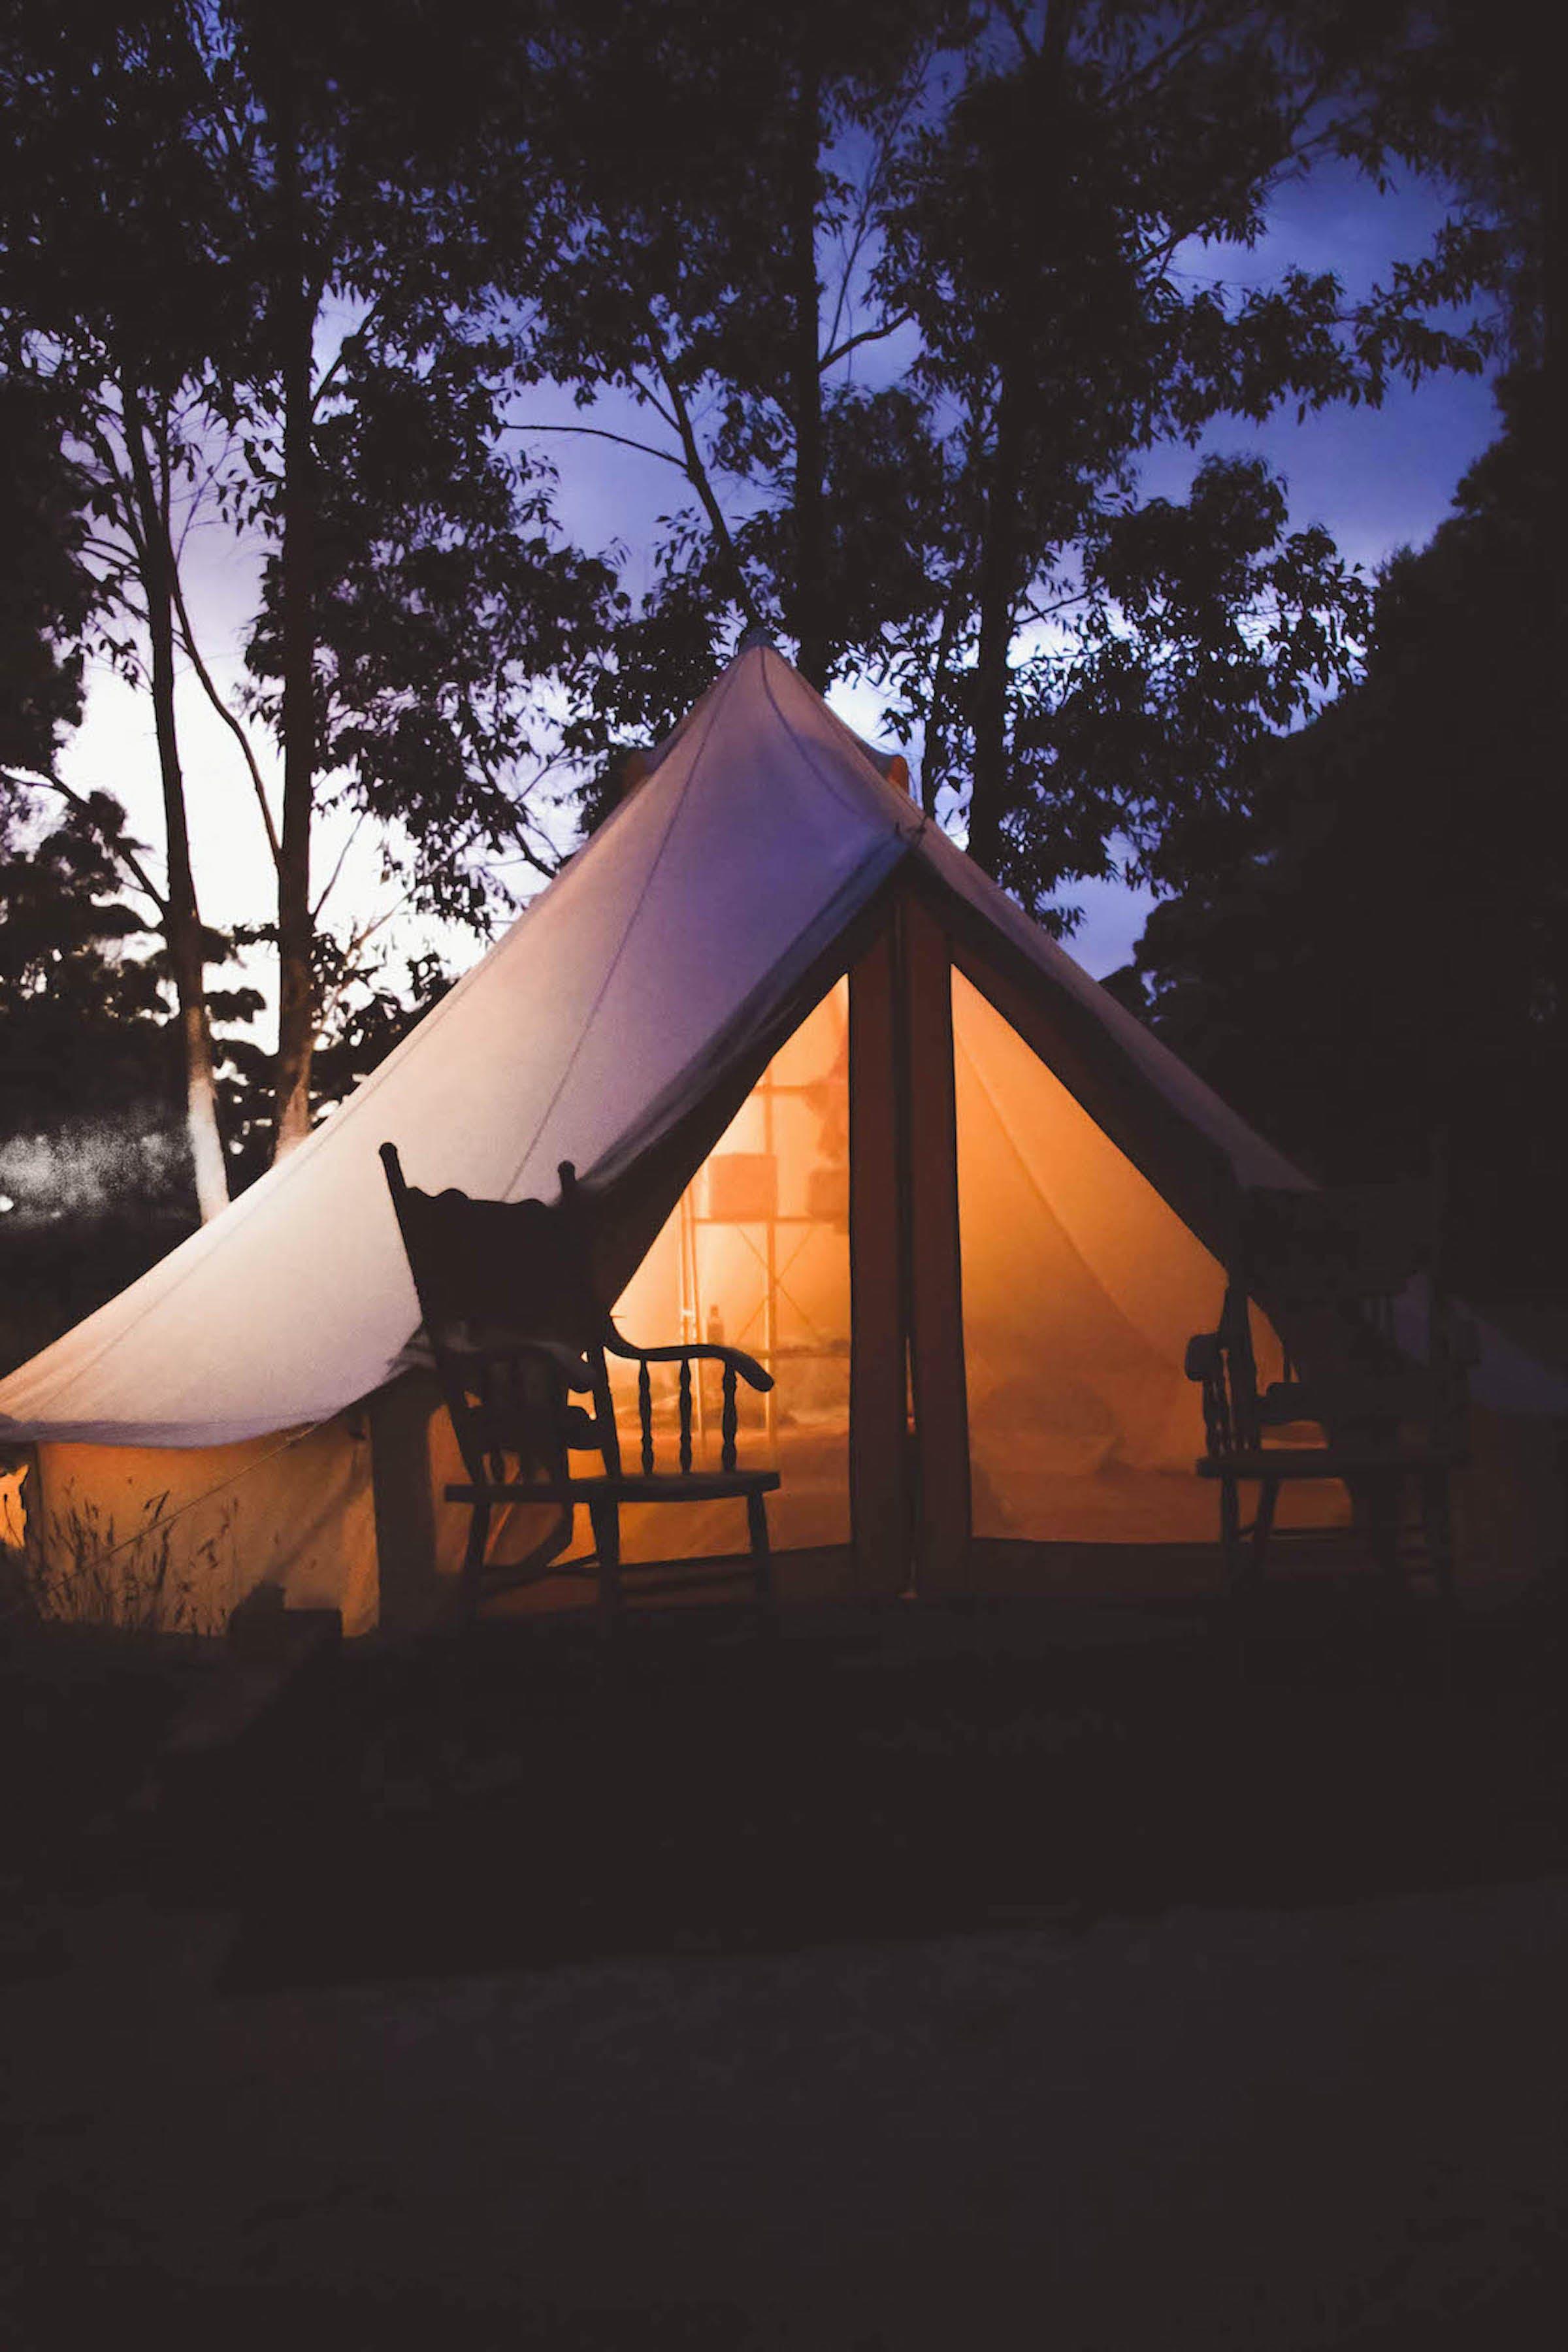 Gratis arkivbilde med camping, glamping, himmel, kveld